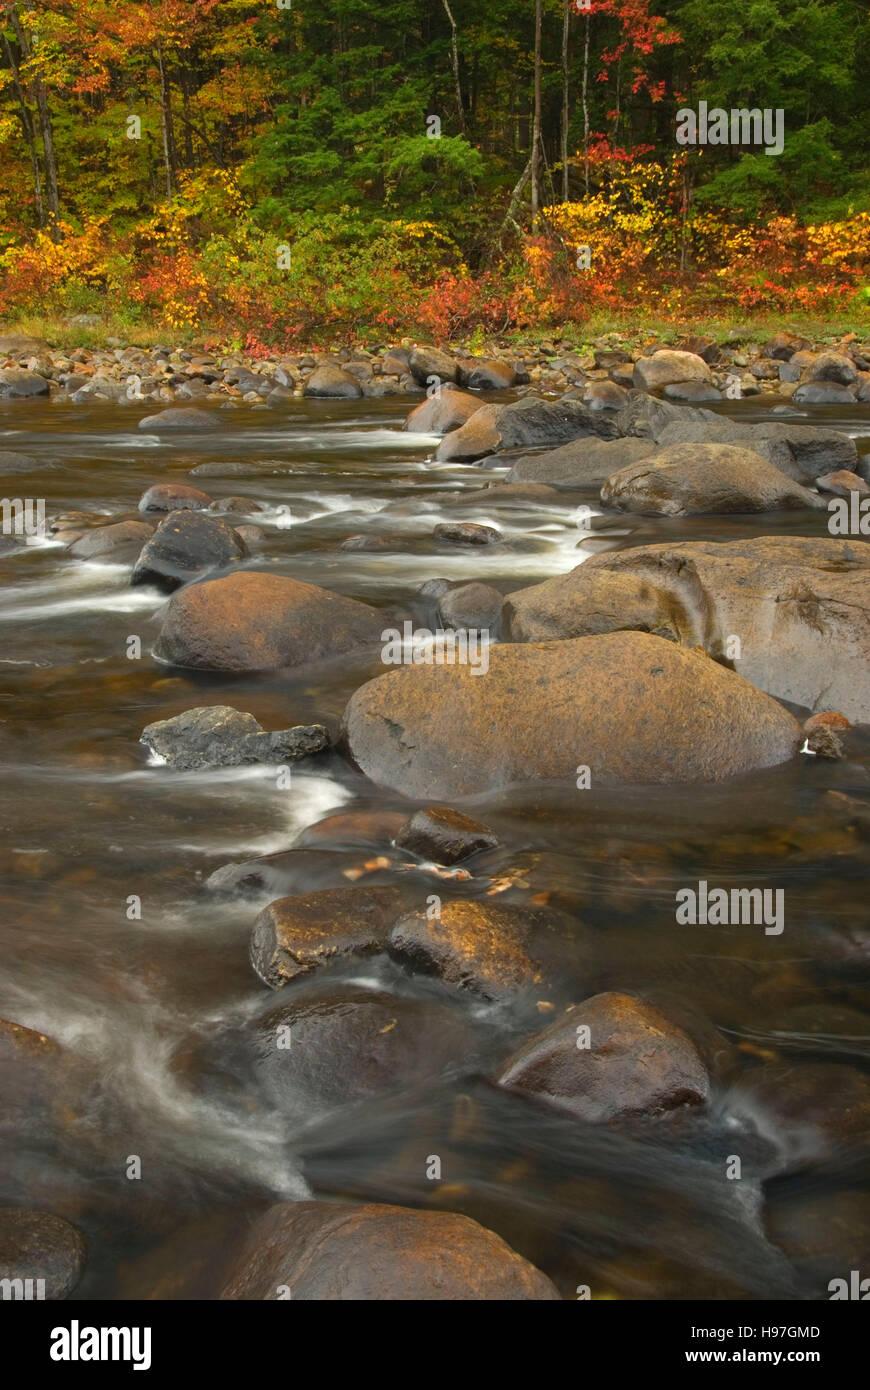 Sacandaga River, Wilcox Lake Wild Forest, Adirondack Forest Preserve, New York - Stock Image